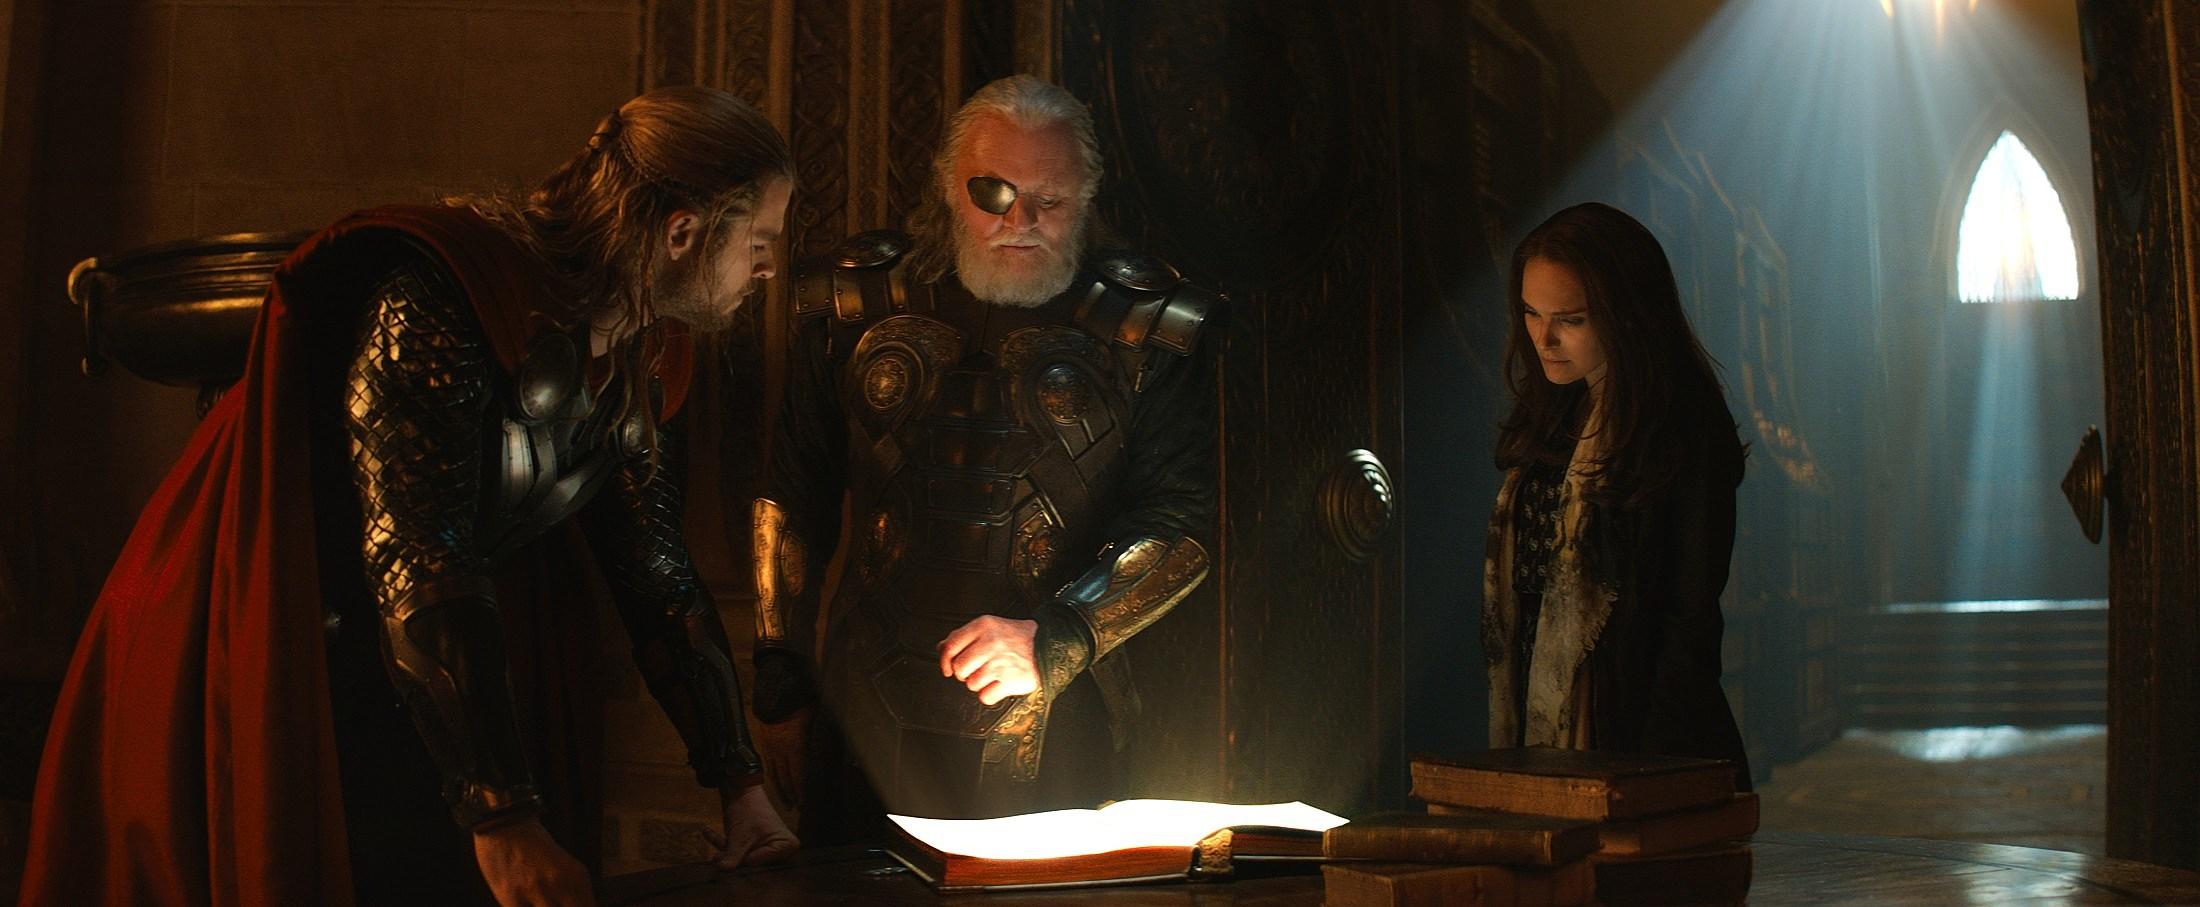 Thor 2 Pics The Dark World